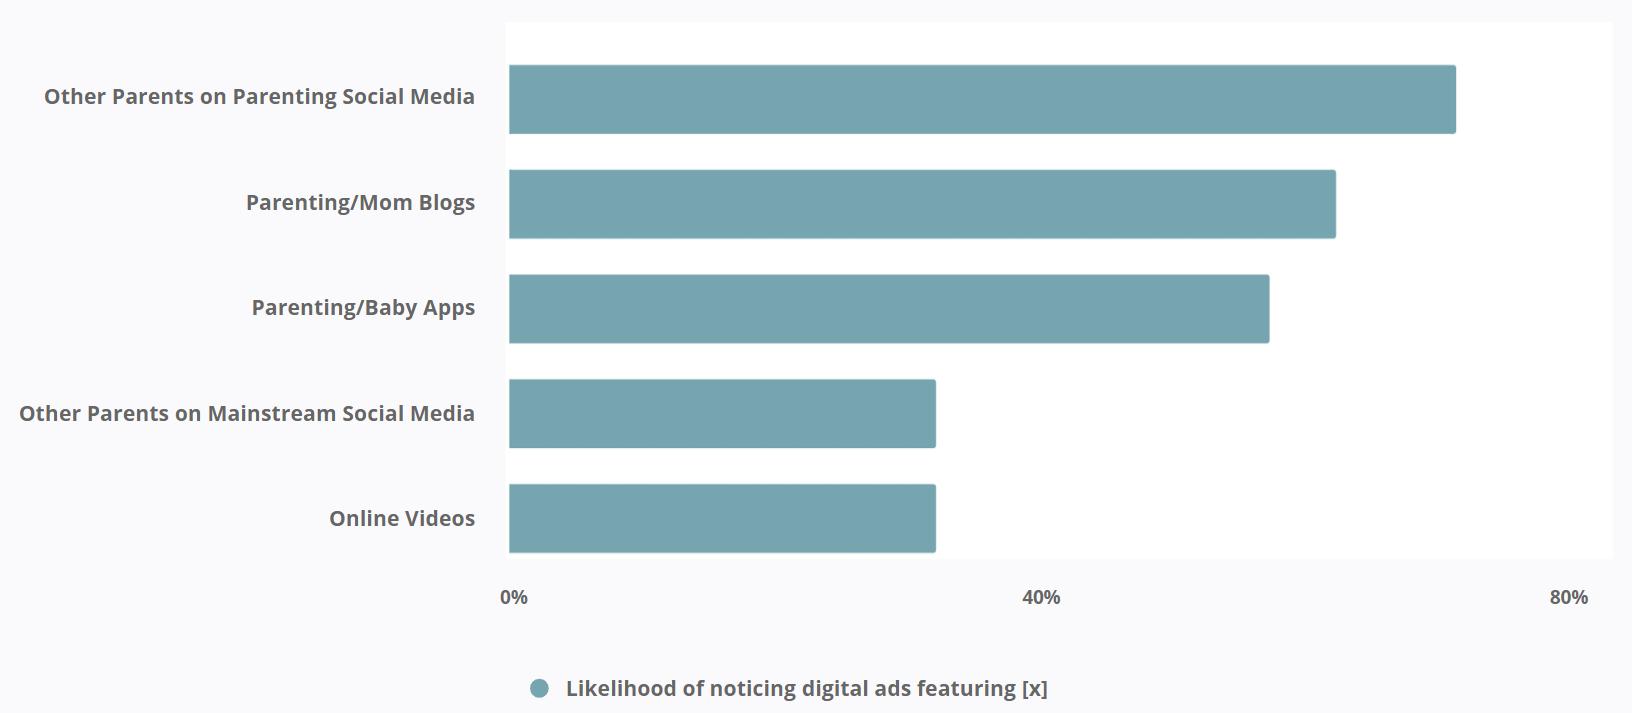 Likelihood of noticing digital ads featuring [x]